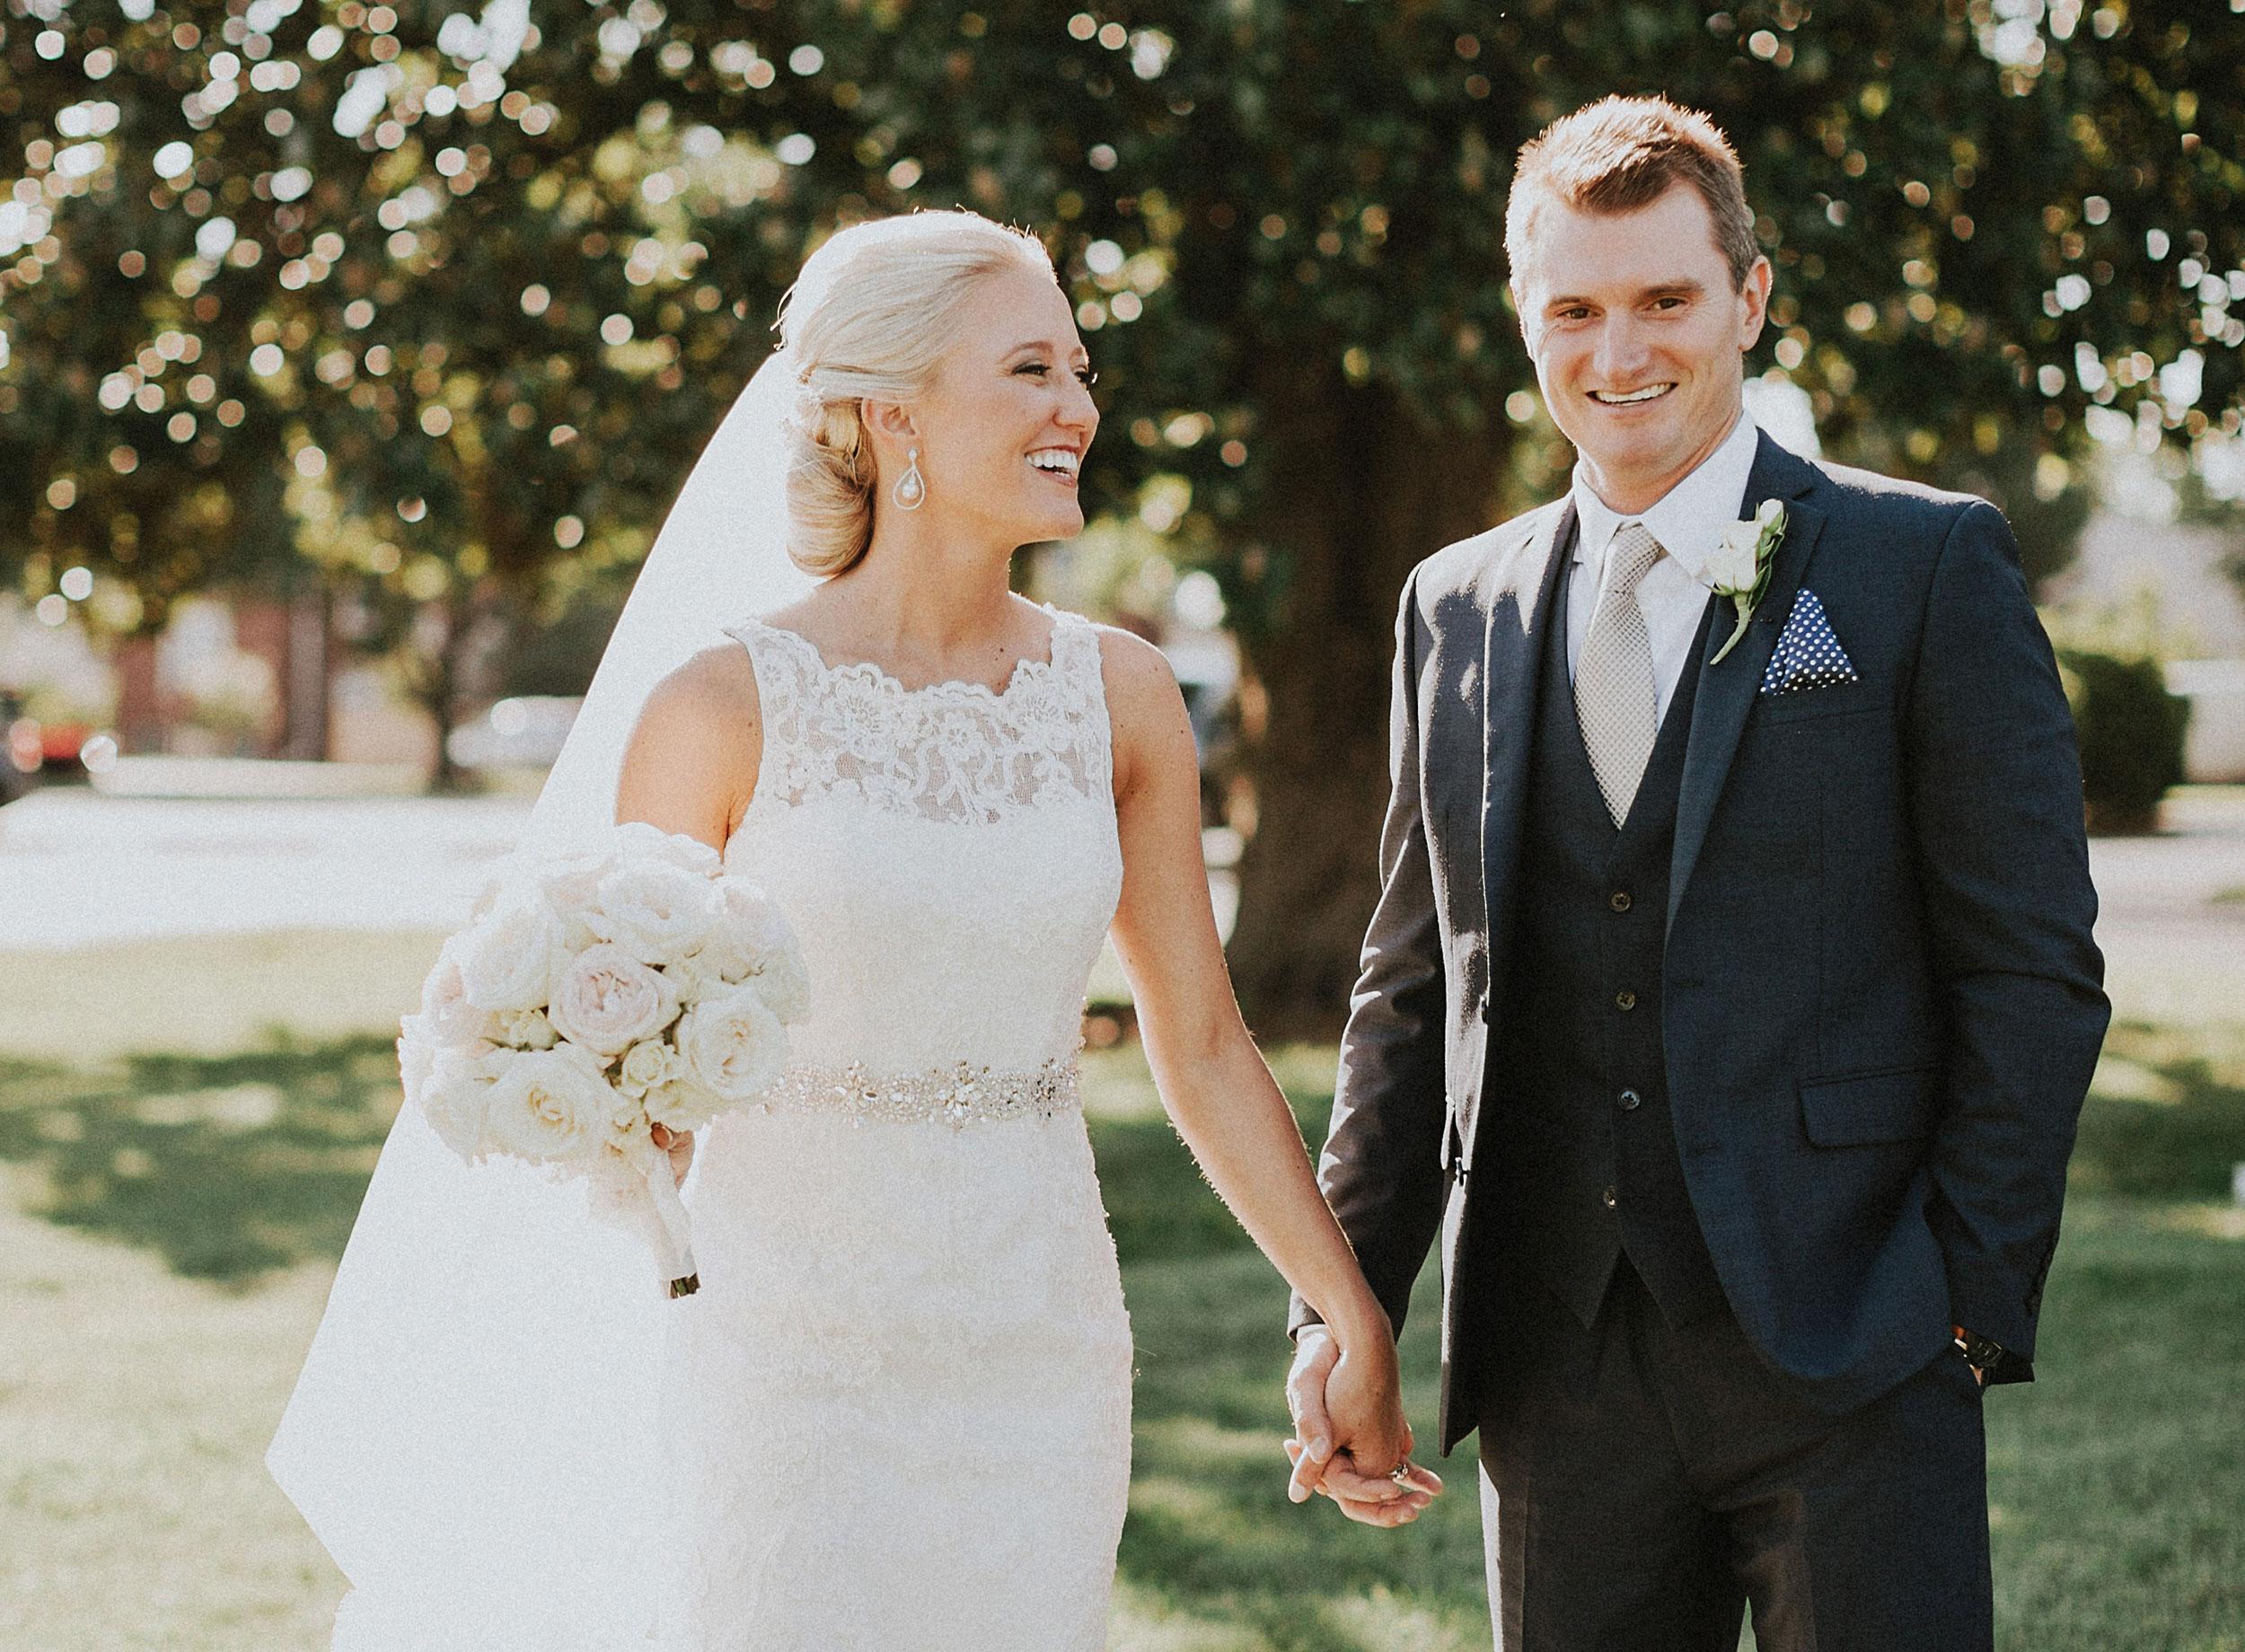 olmsted-wedding-louisville-kentucky-033.JPG